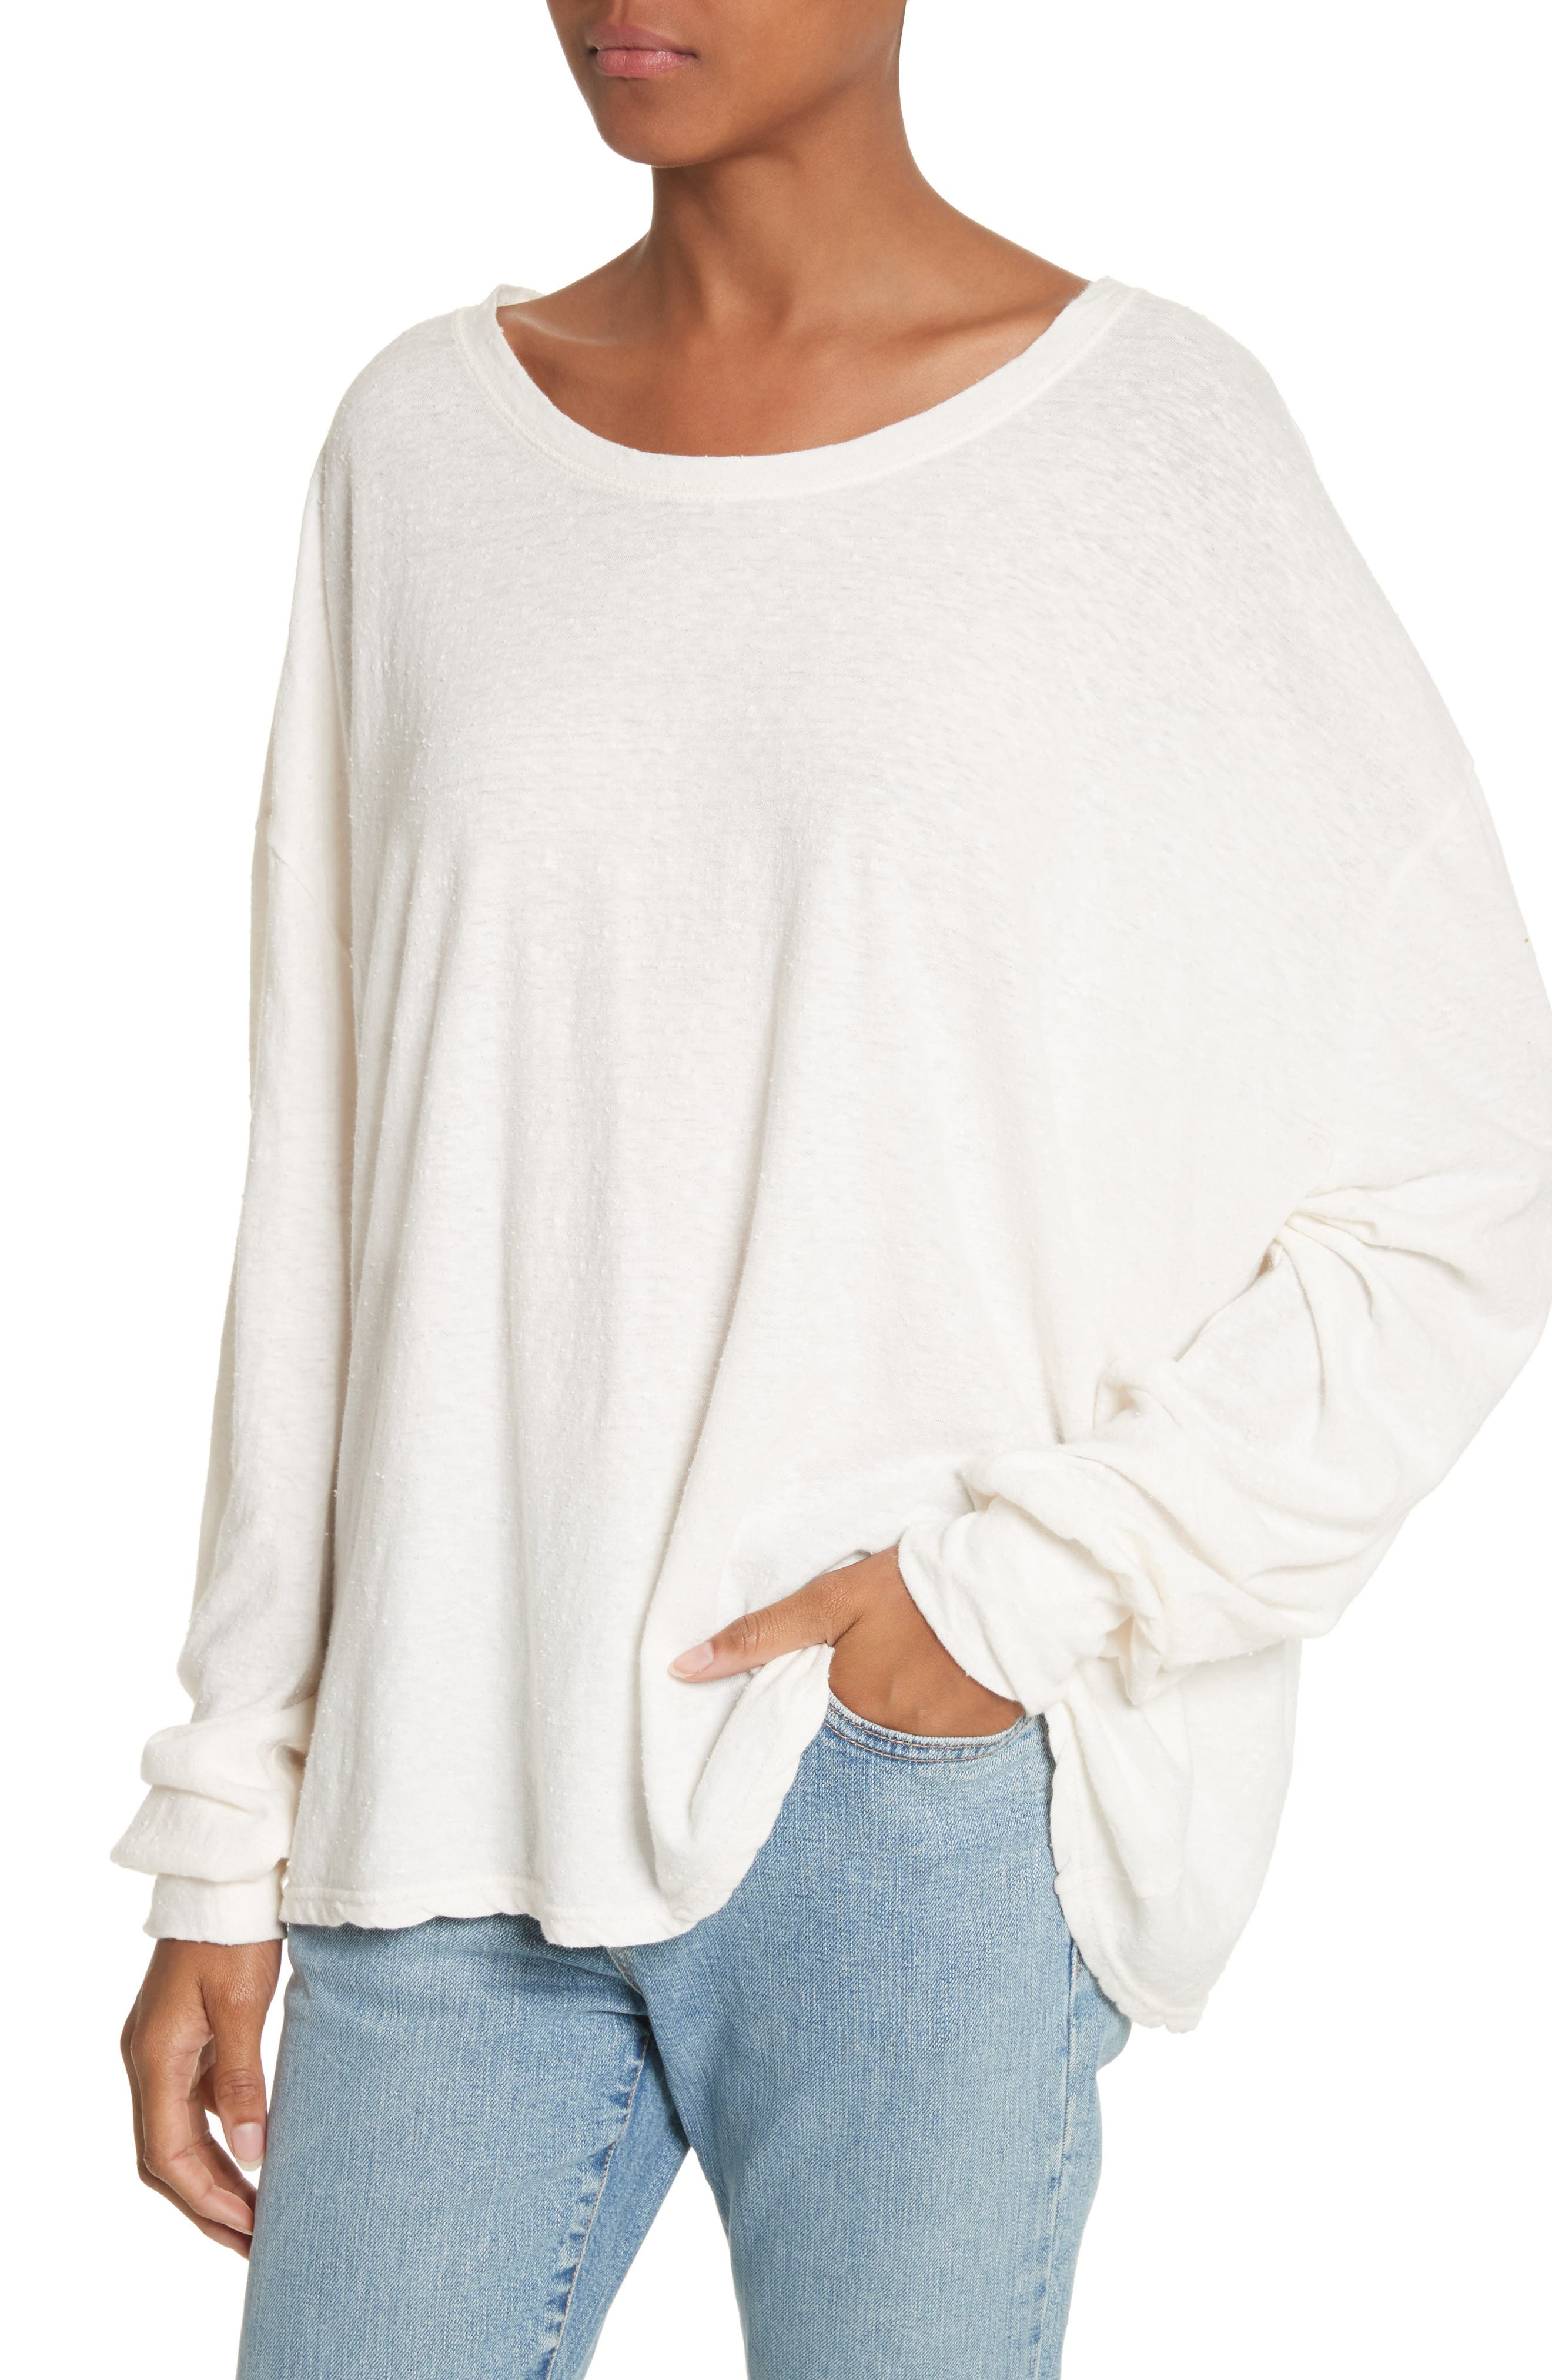 Solano Oversize Cotton Top,                             Alternate thumbnail 4, color,                             White